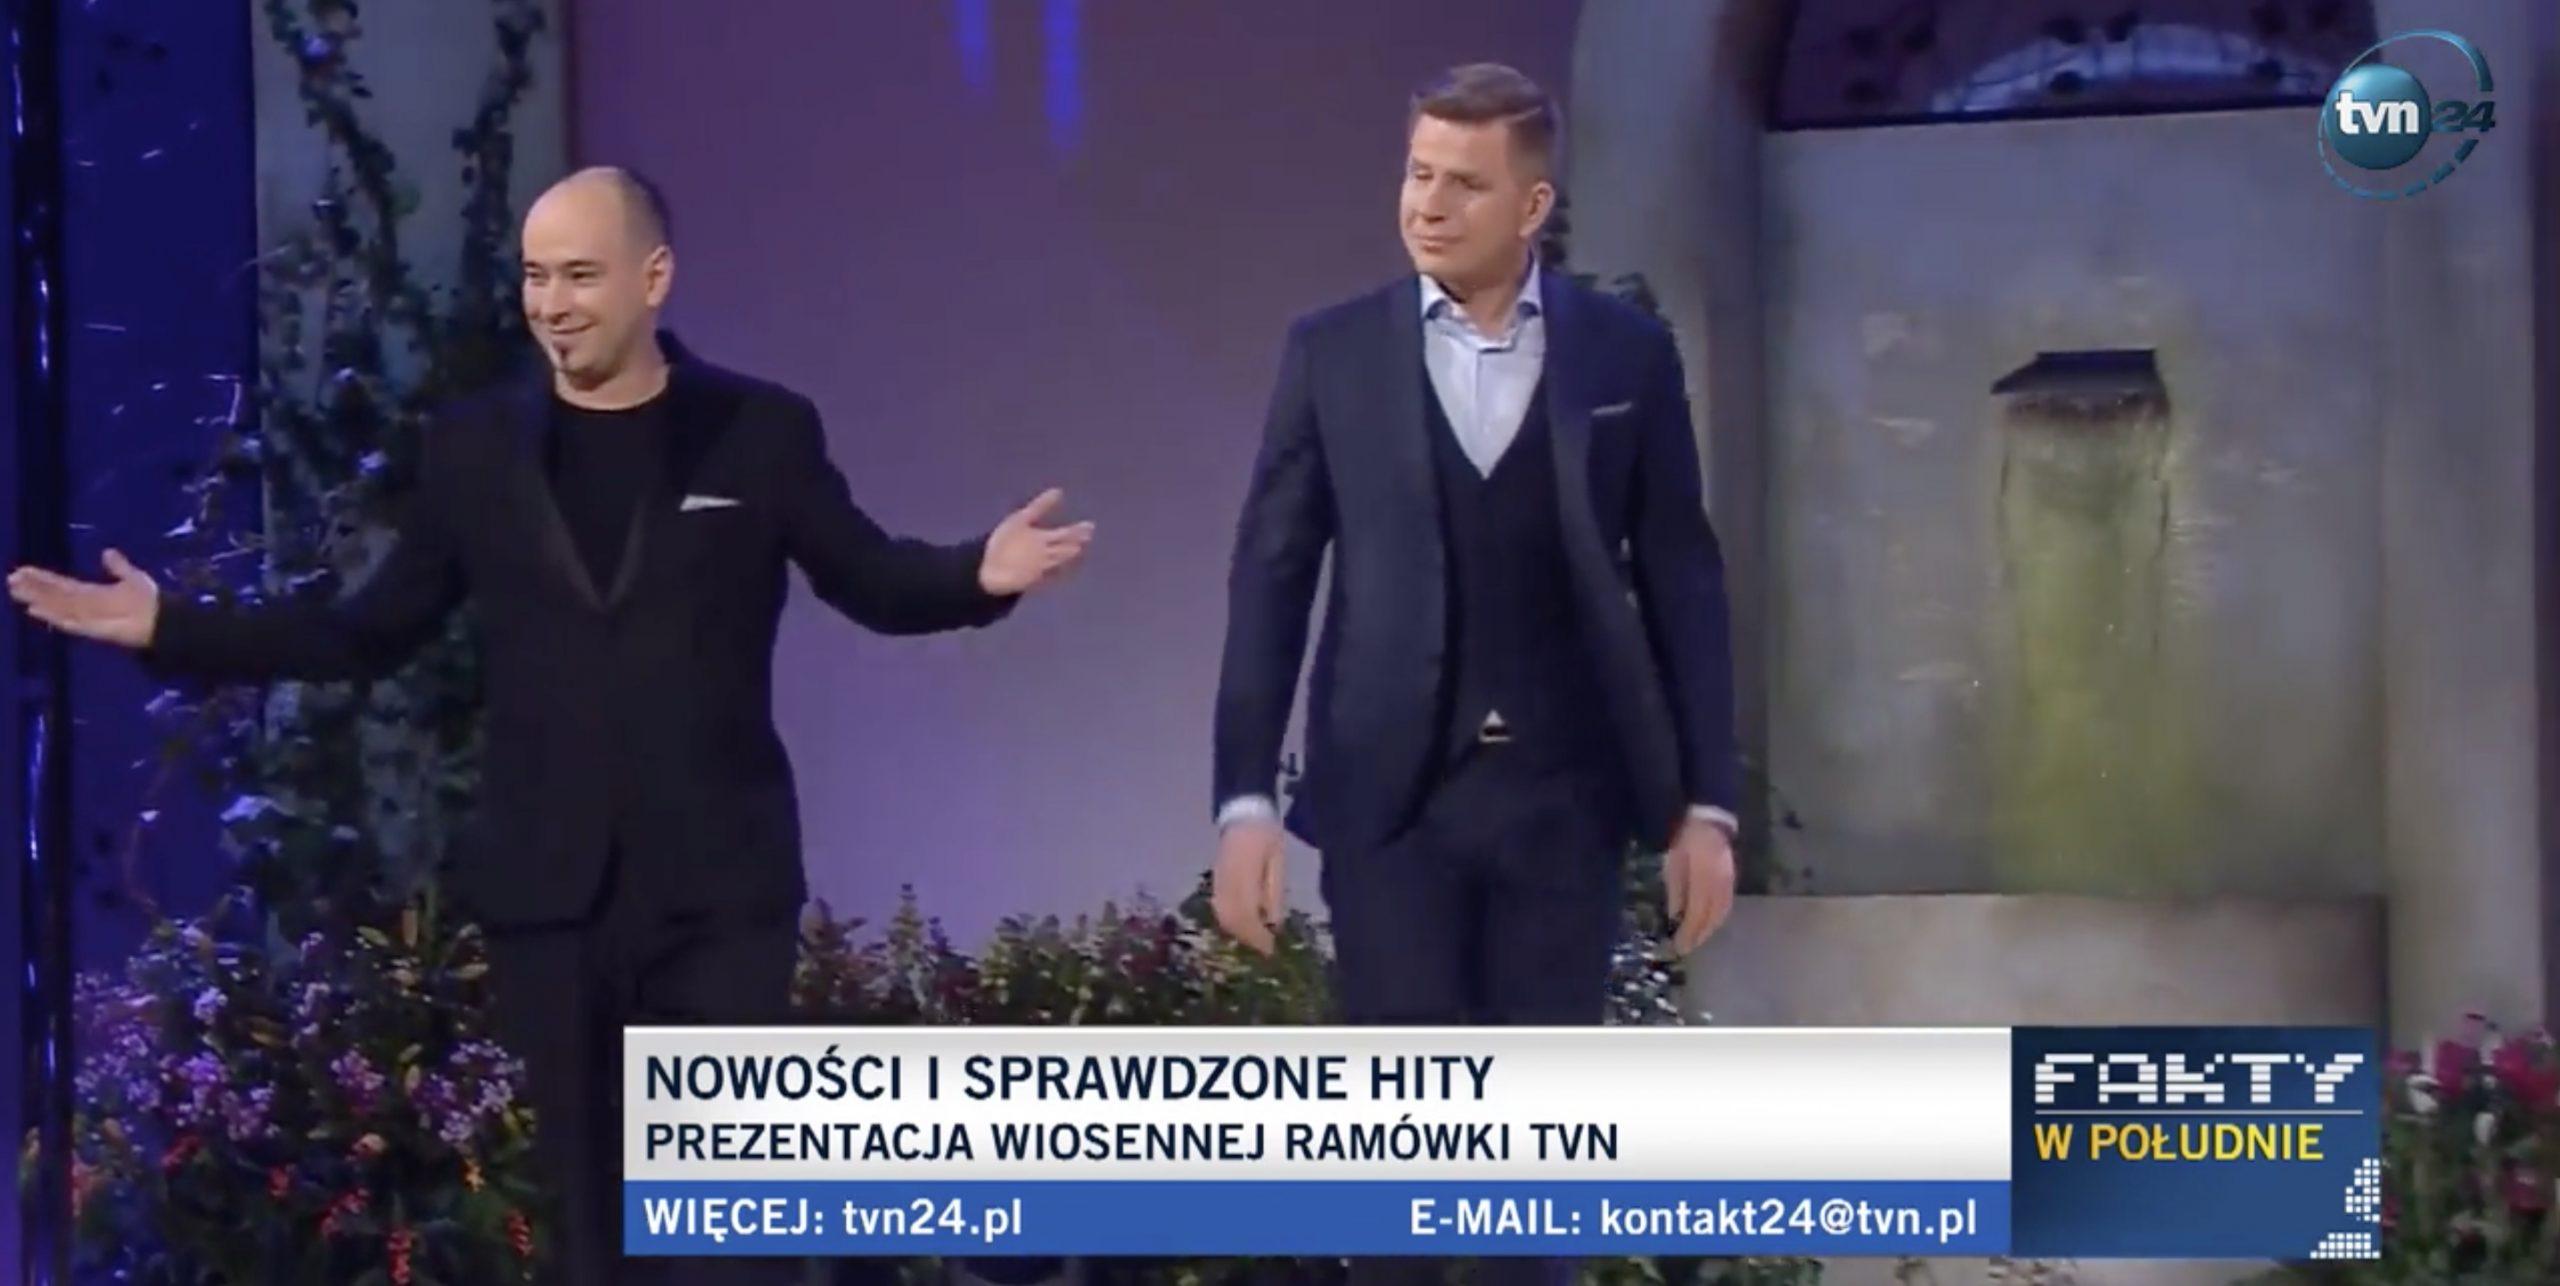 tvn_ramowka_www-1